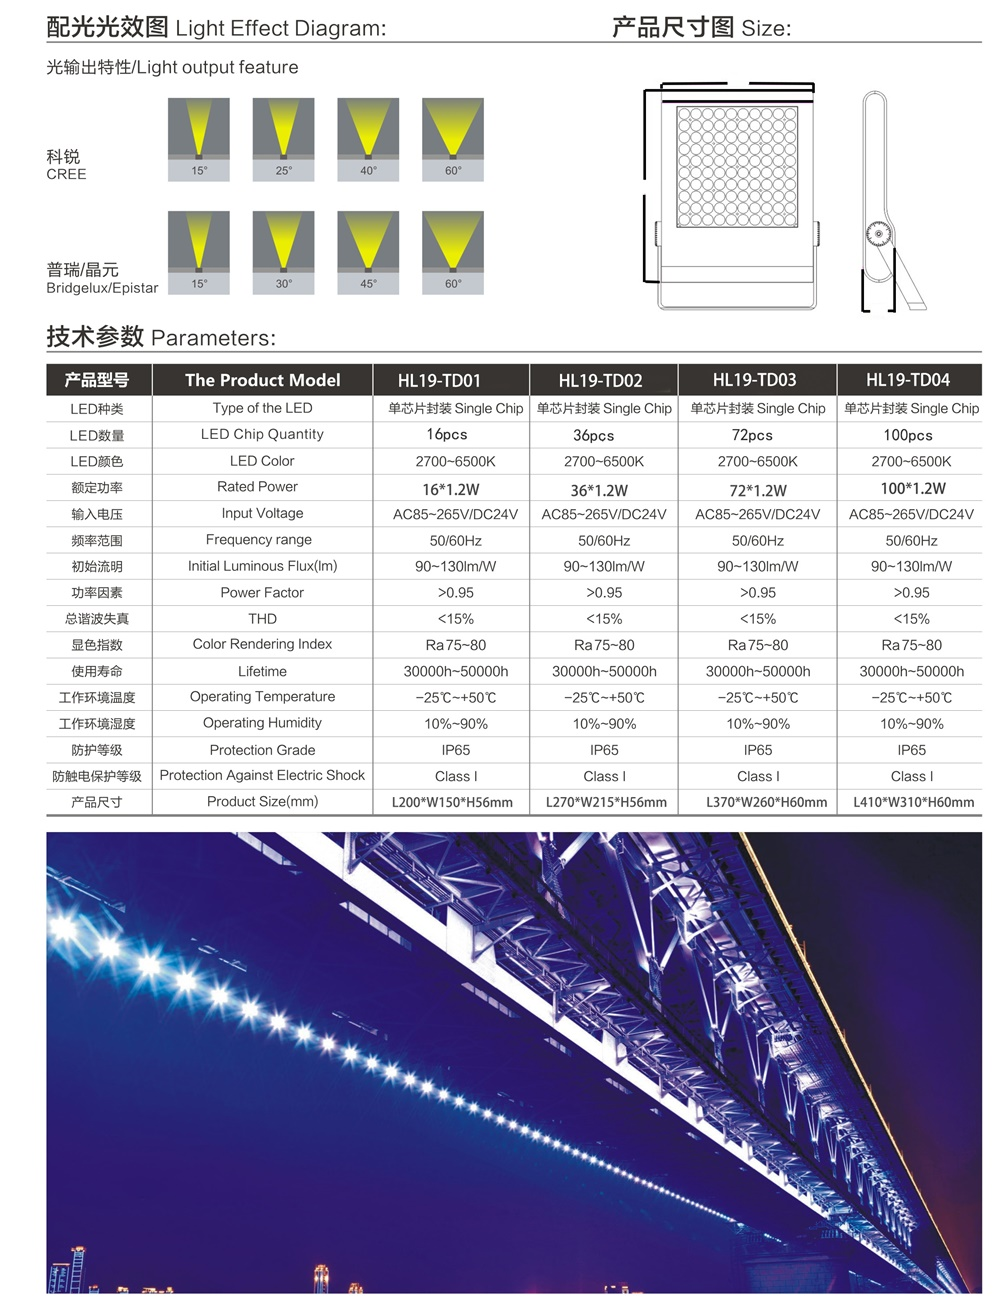 HL201805畫冊-2-17-1_看圖王2.jpg